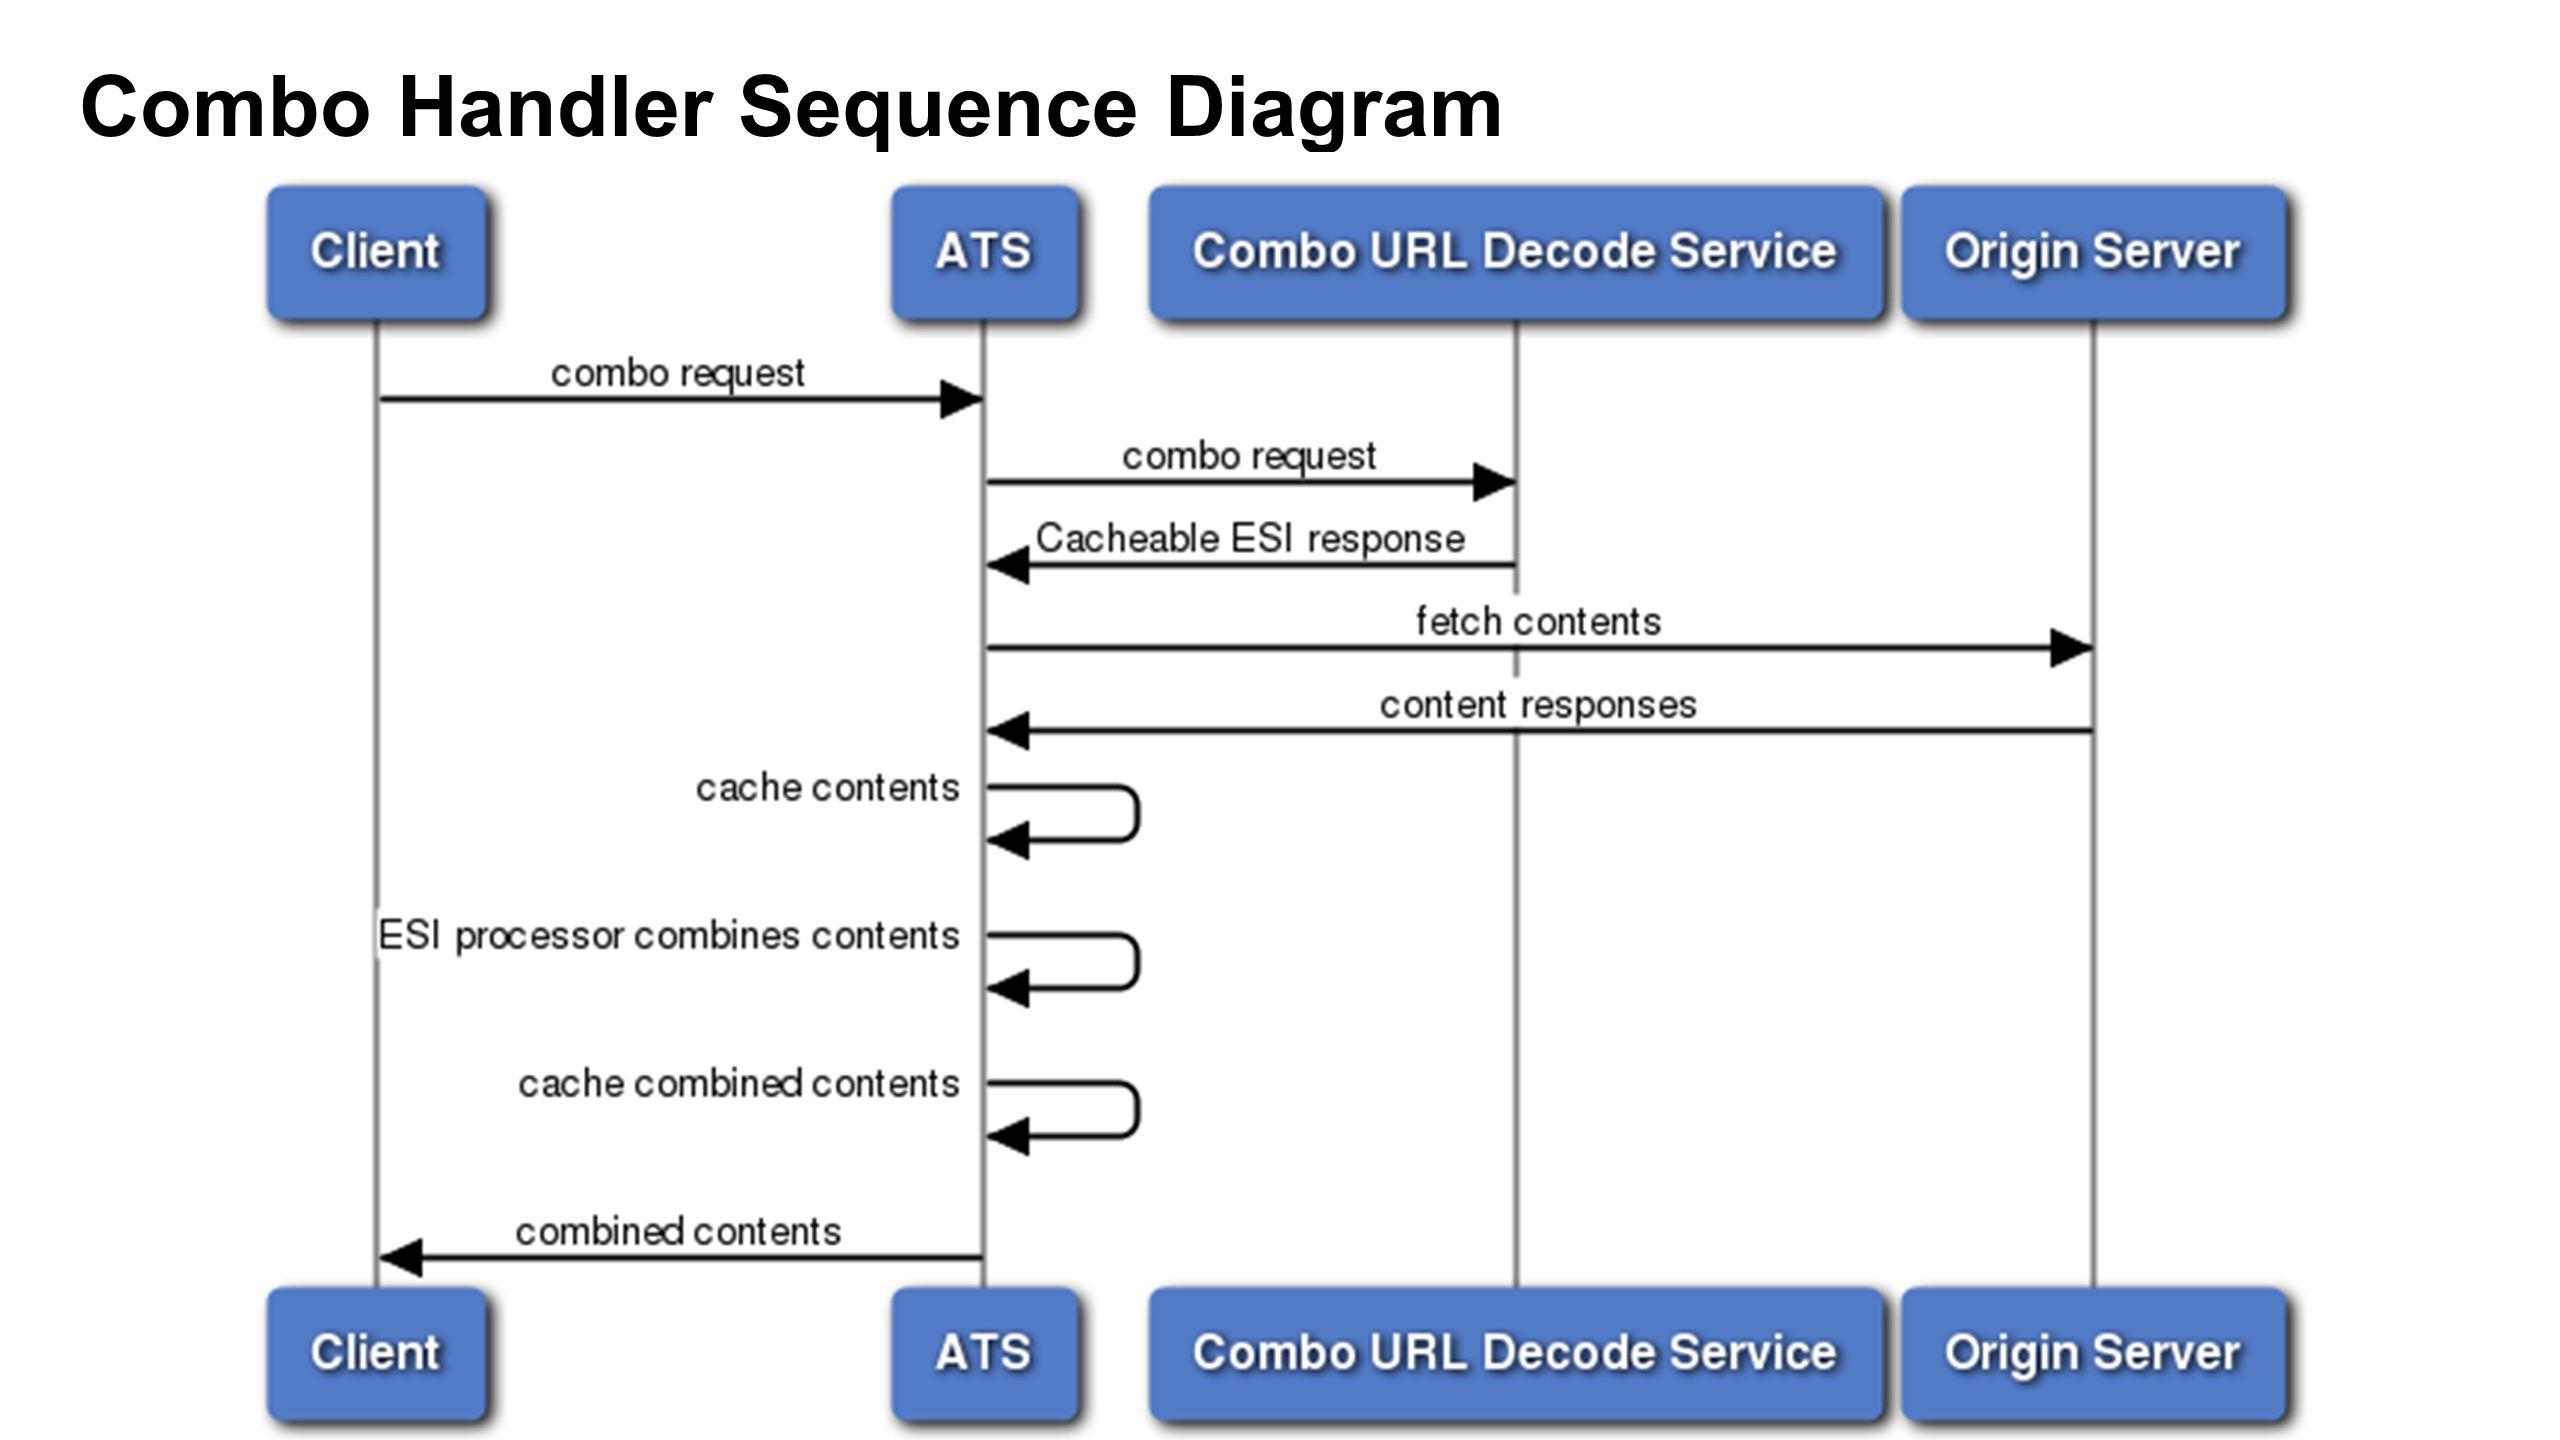 Combo Handler Sequence Diagram